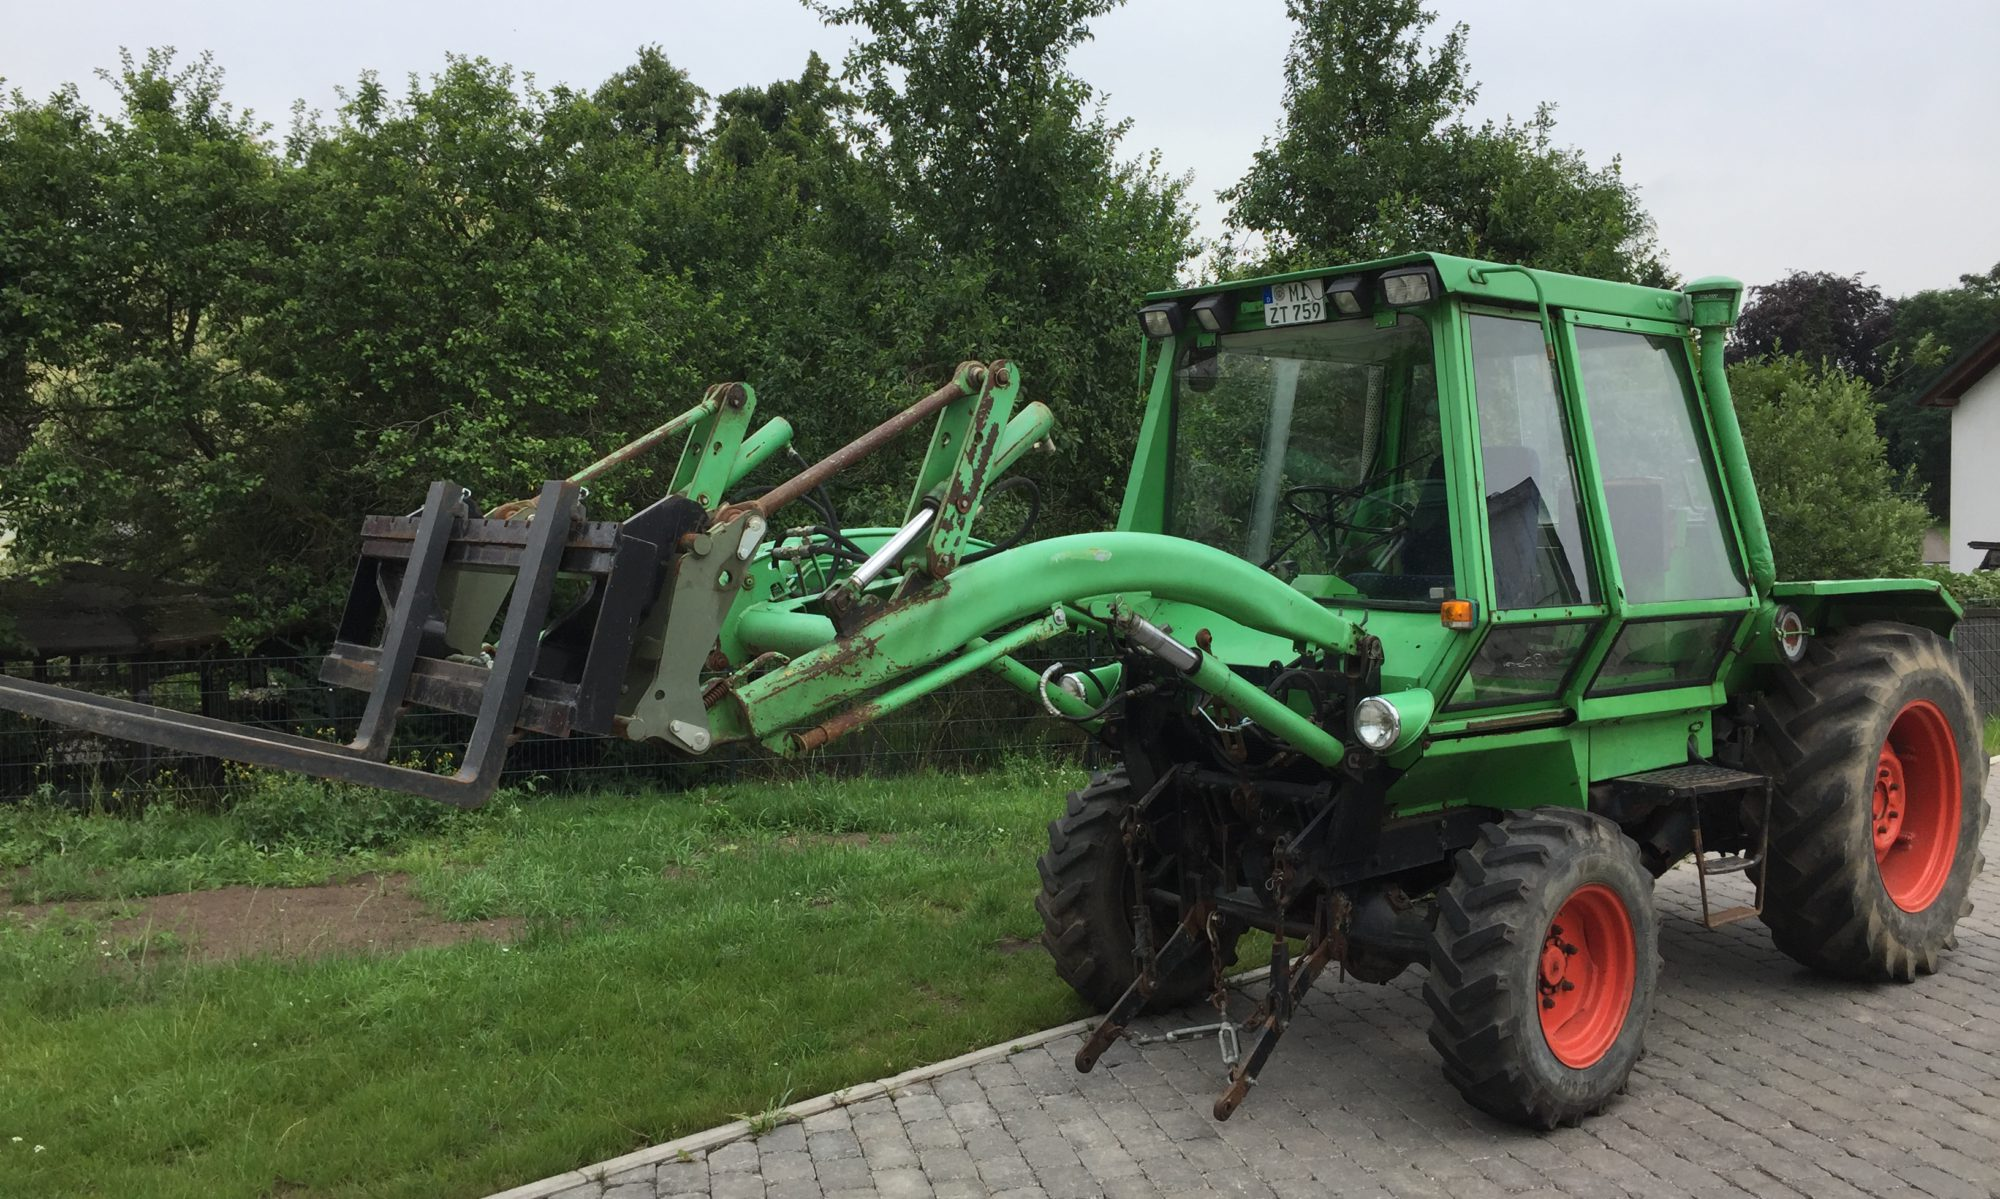 Bekemeier Baumaschinen Porta Westfalica Verleih Vermietung Sonderfahrten